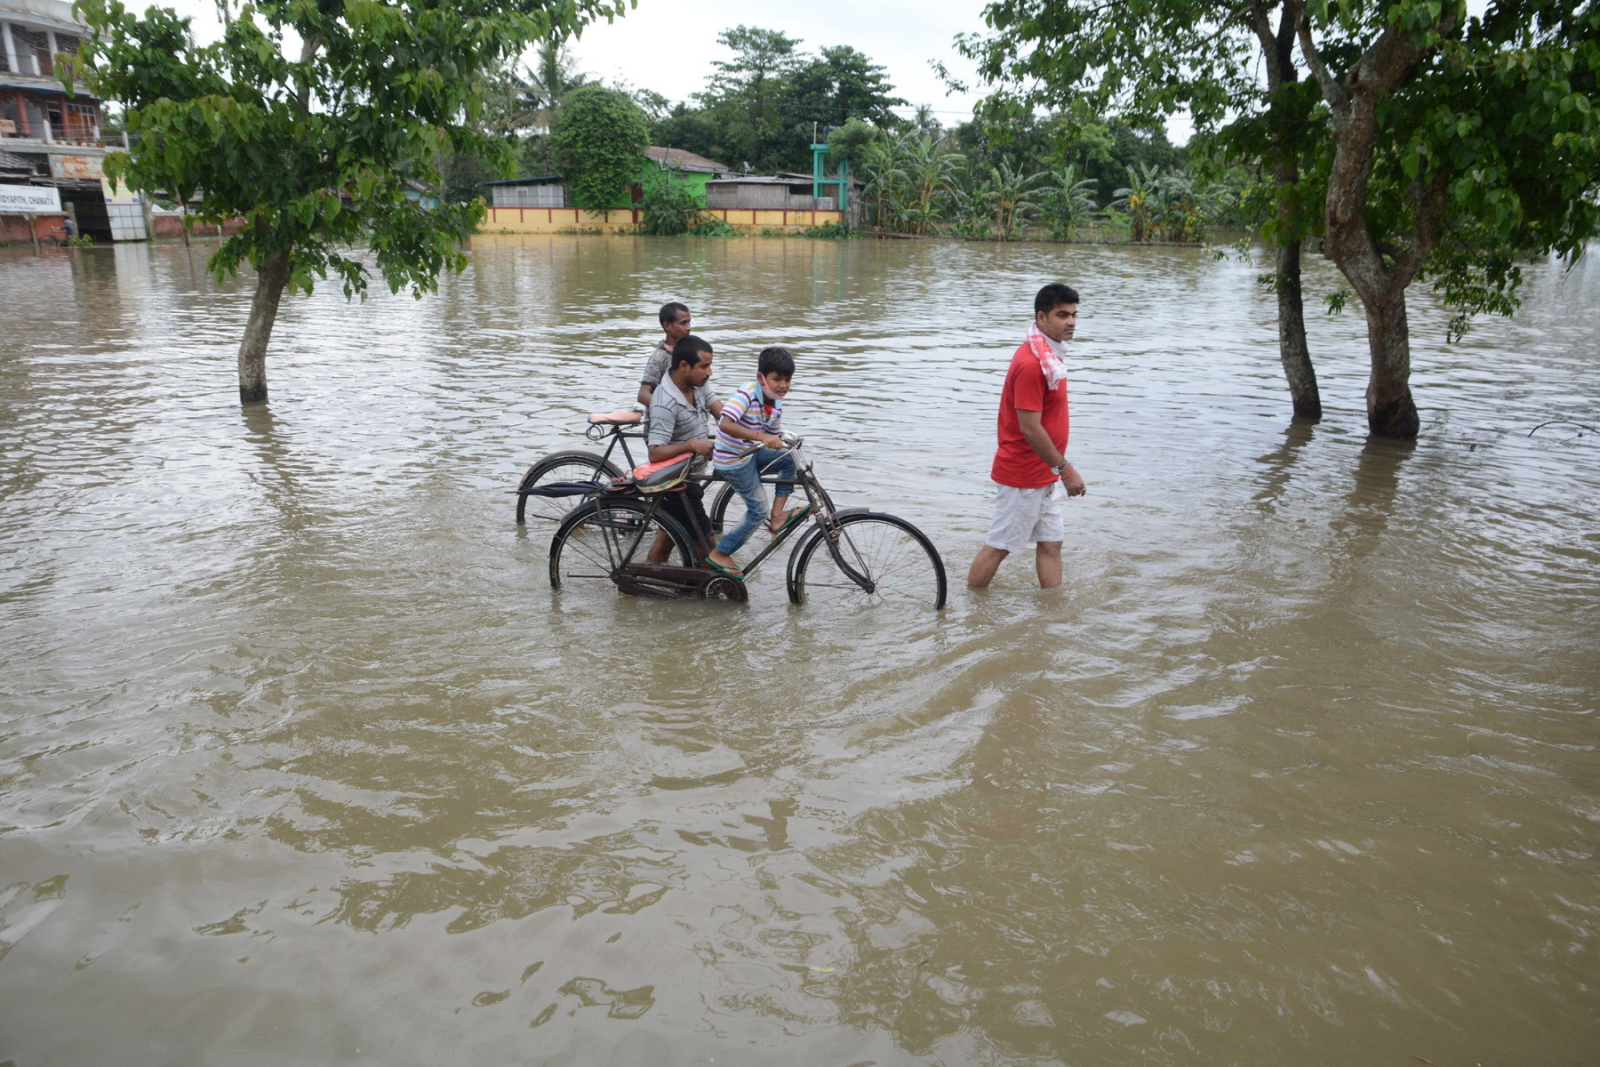 Powódź w Indiach  EPA/STR